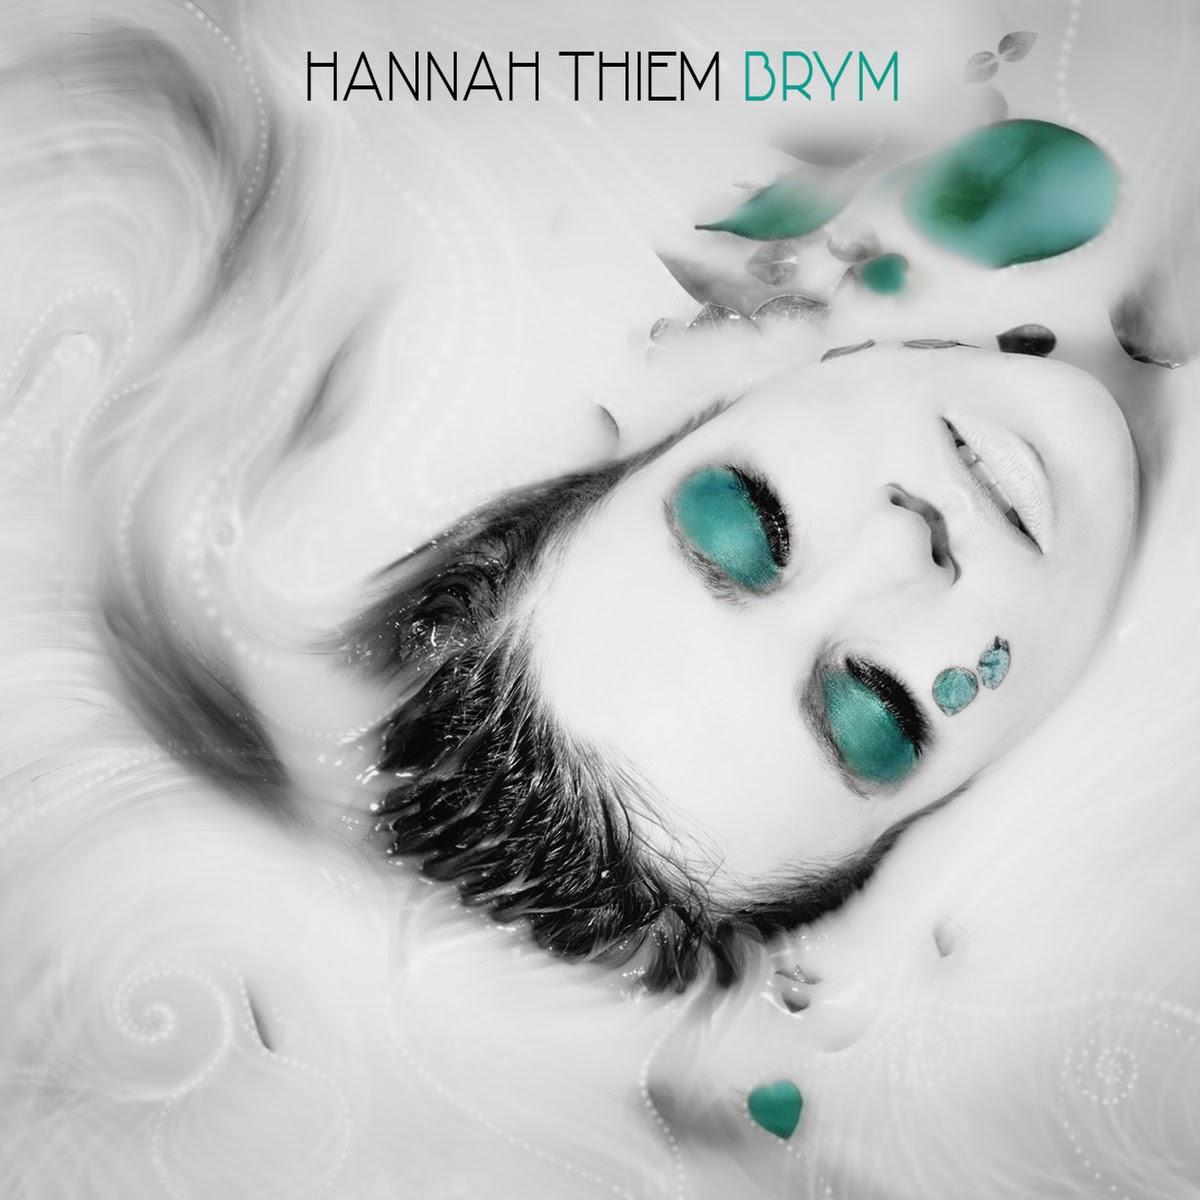 http://www.d4am.net/2014/06/hannah-thiem-brym.html